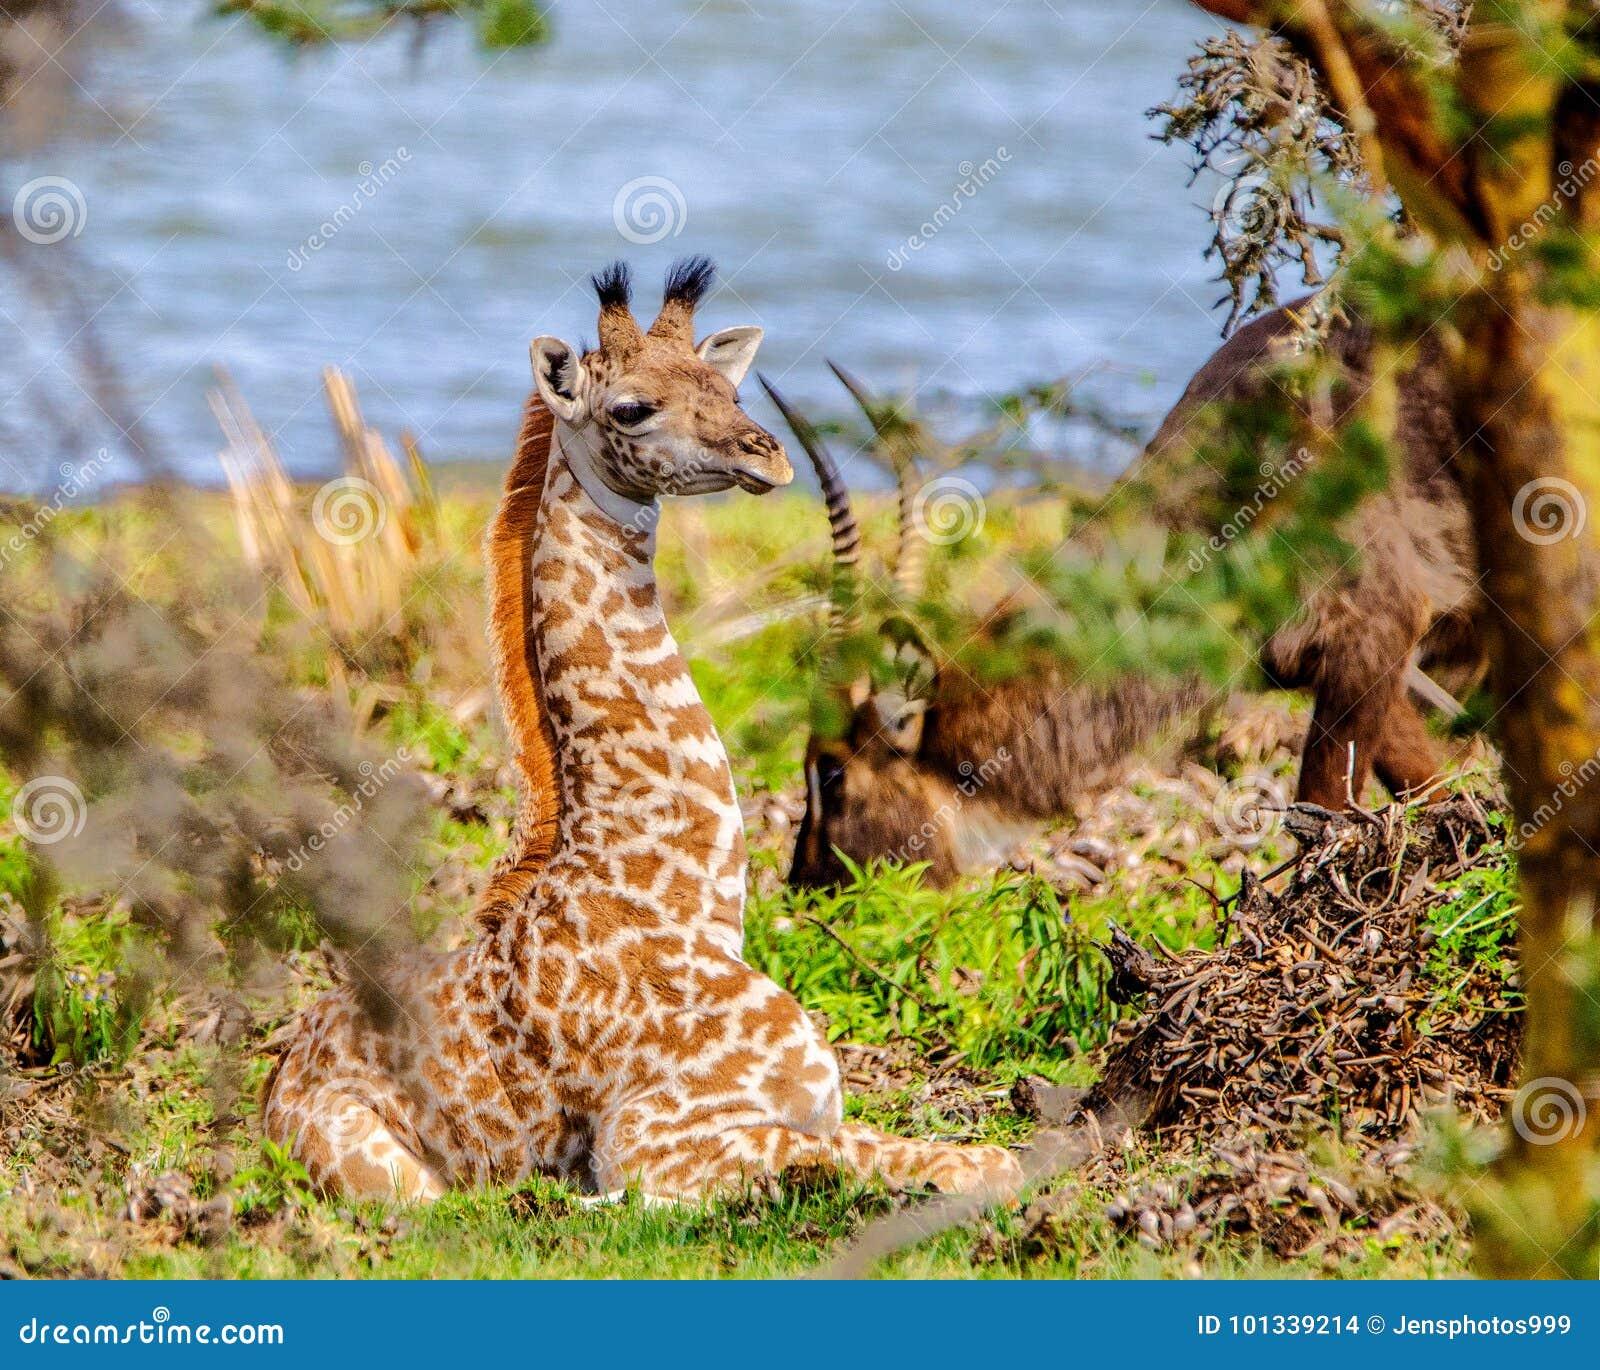 HIding amongst the bushes - Baby Massai Giraffe